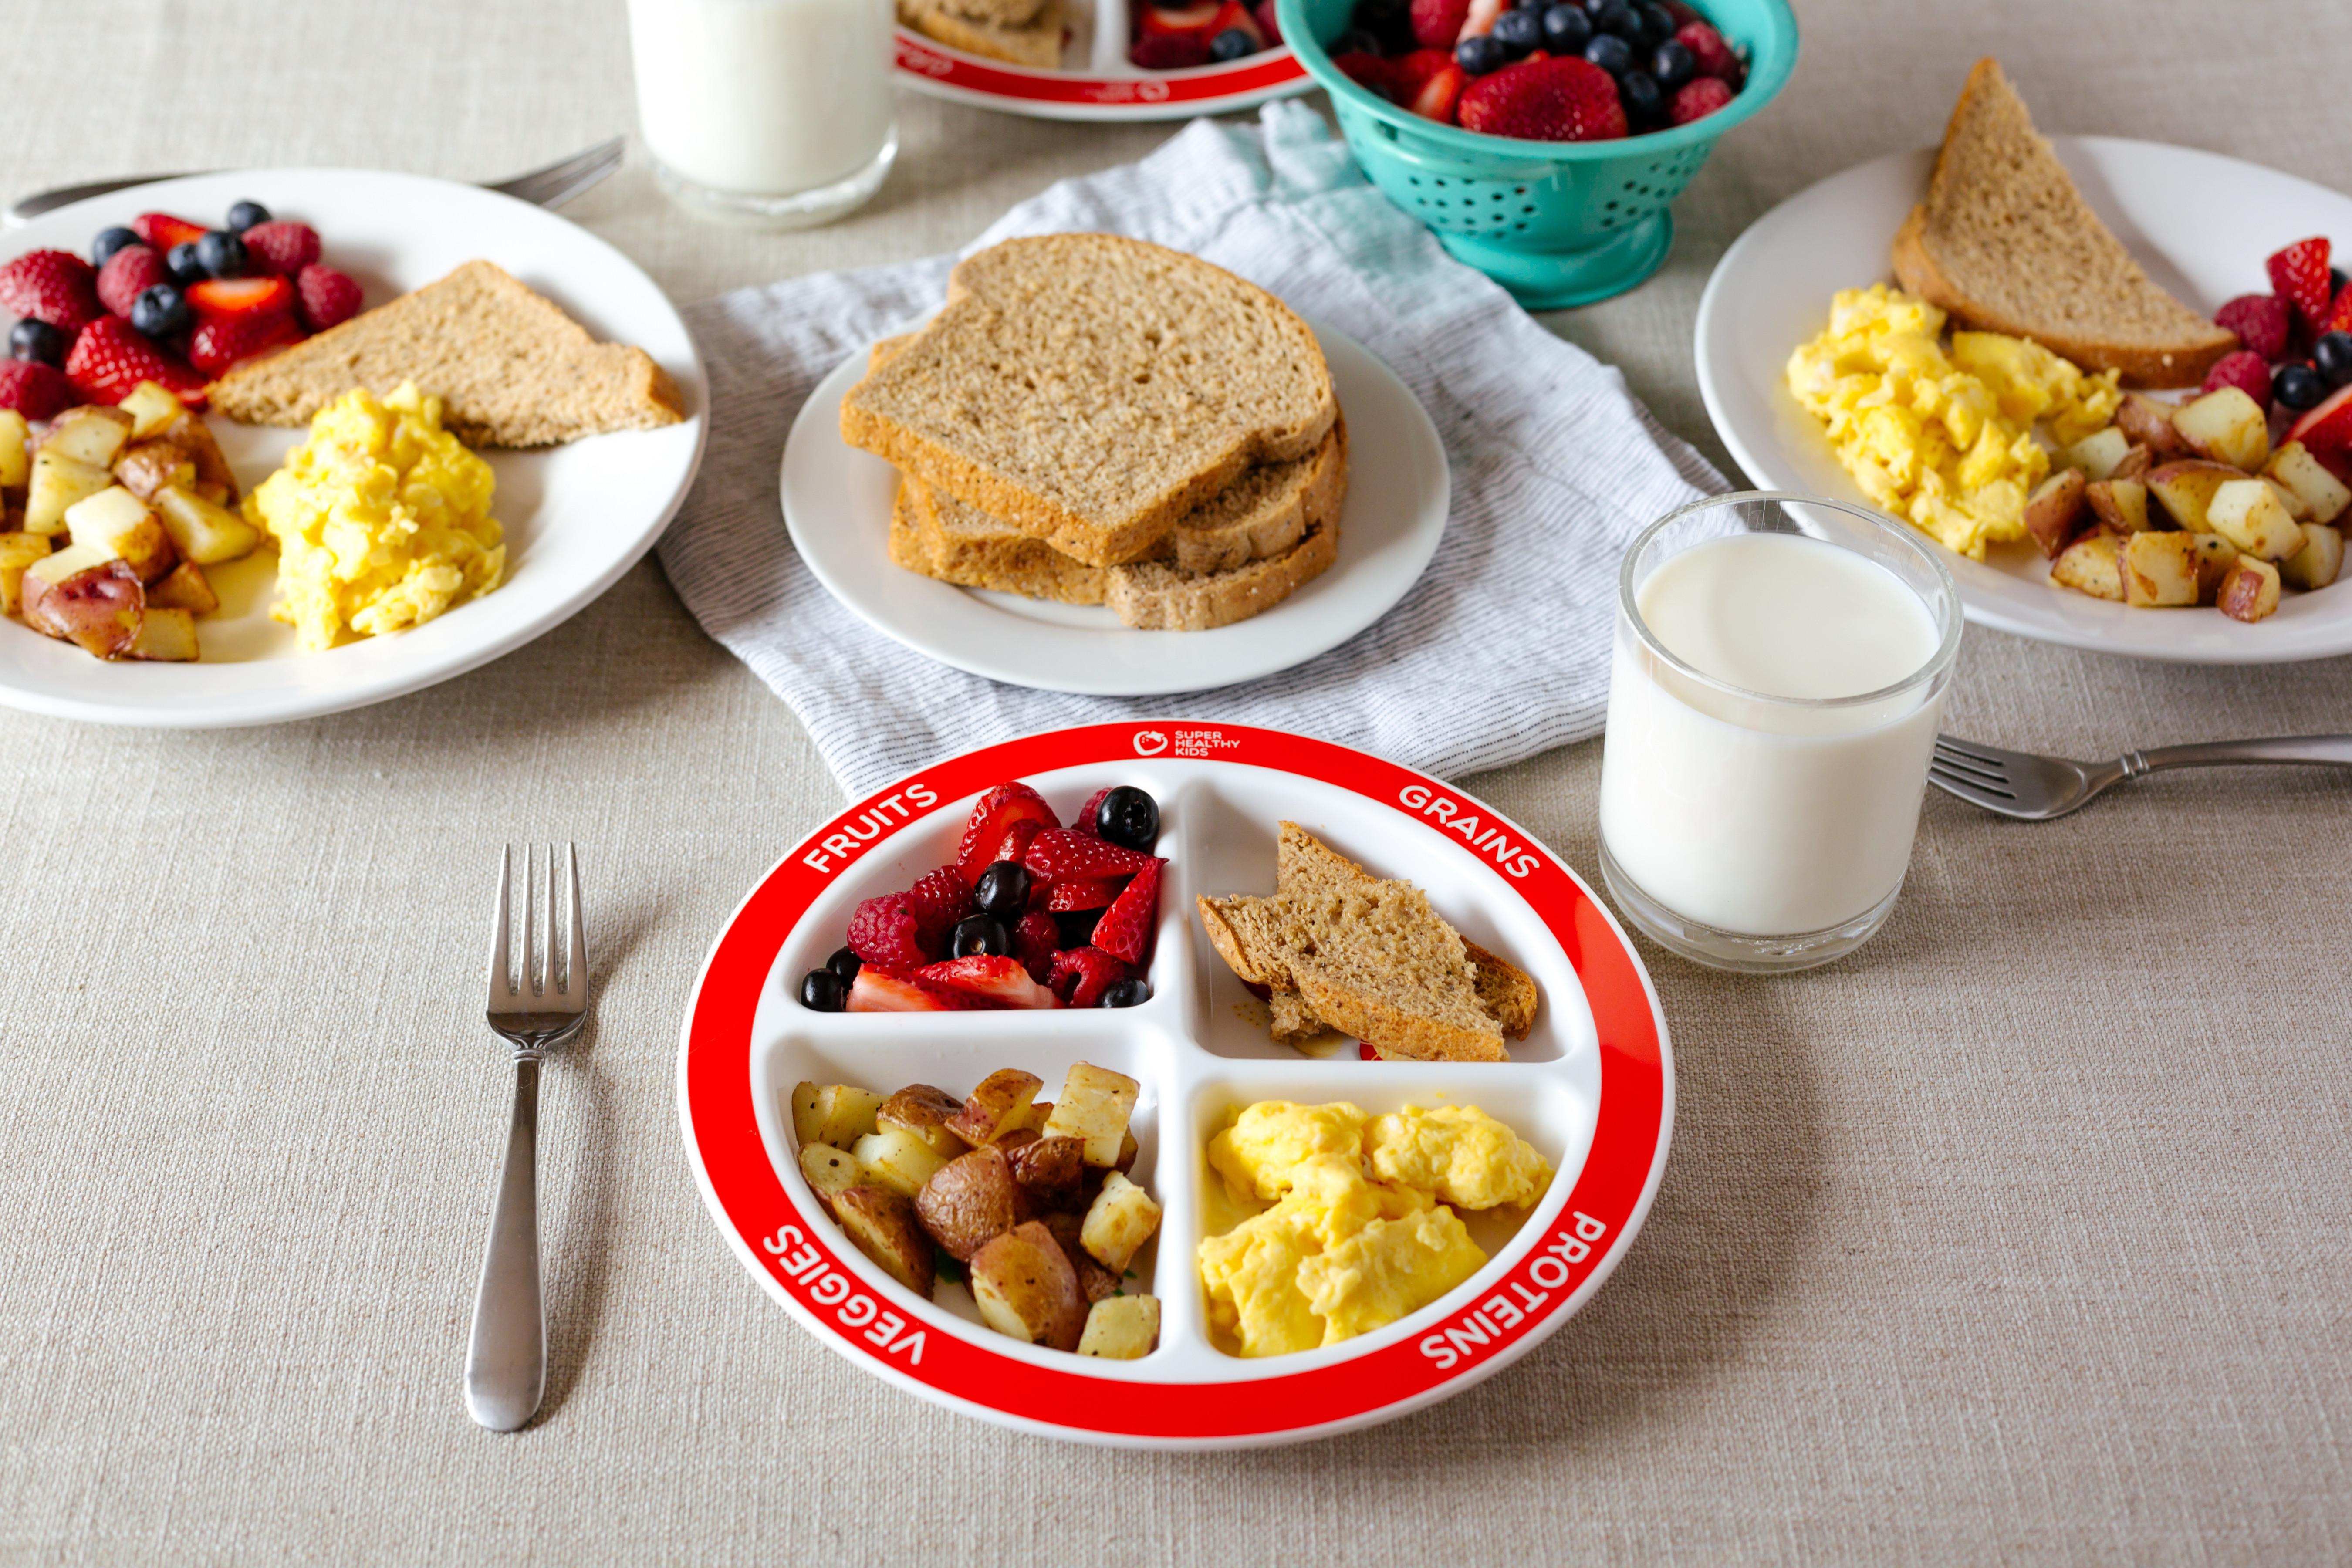 Healthy Breakfast Kids  Healthy Balanced Breakfast with MyPlate